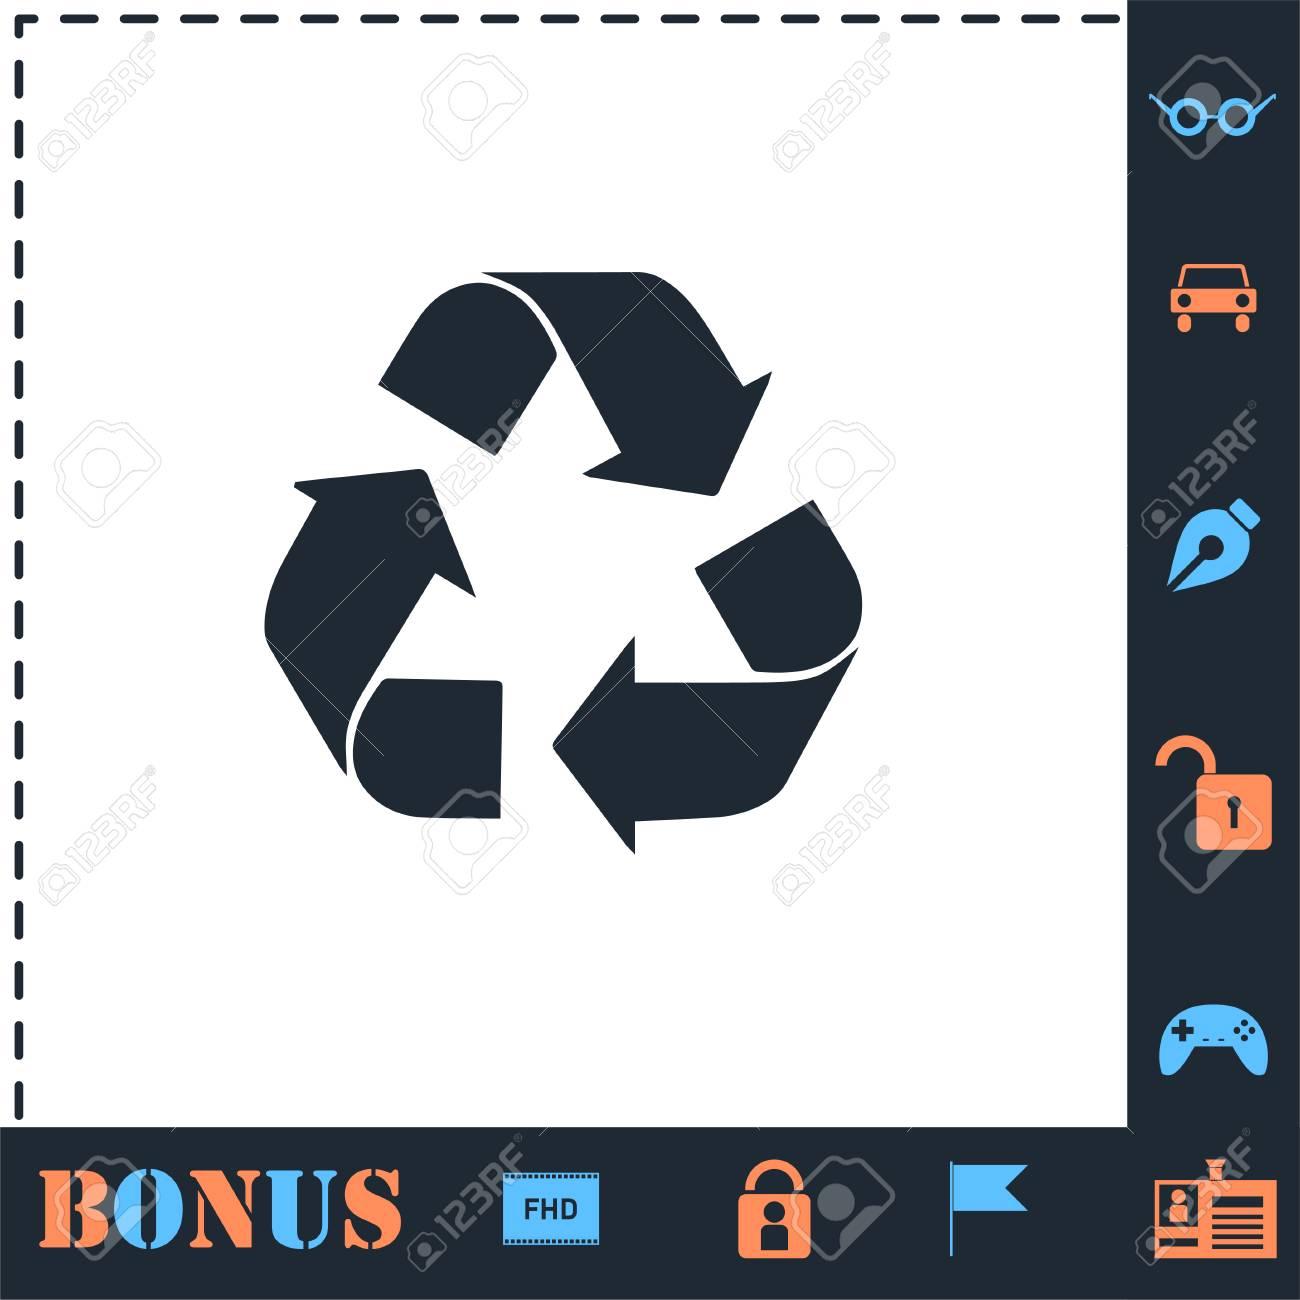 Recycle arrow. Perfect icon with bonus simple icons - 121857565